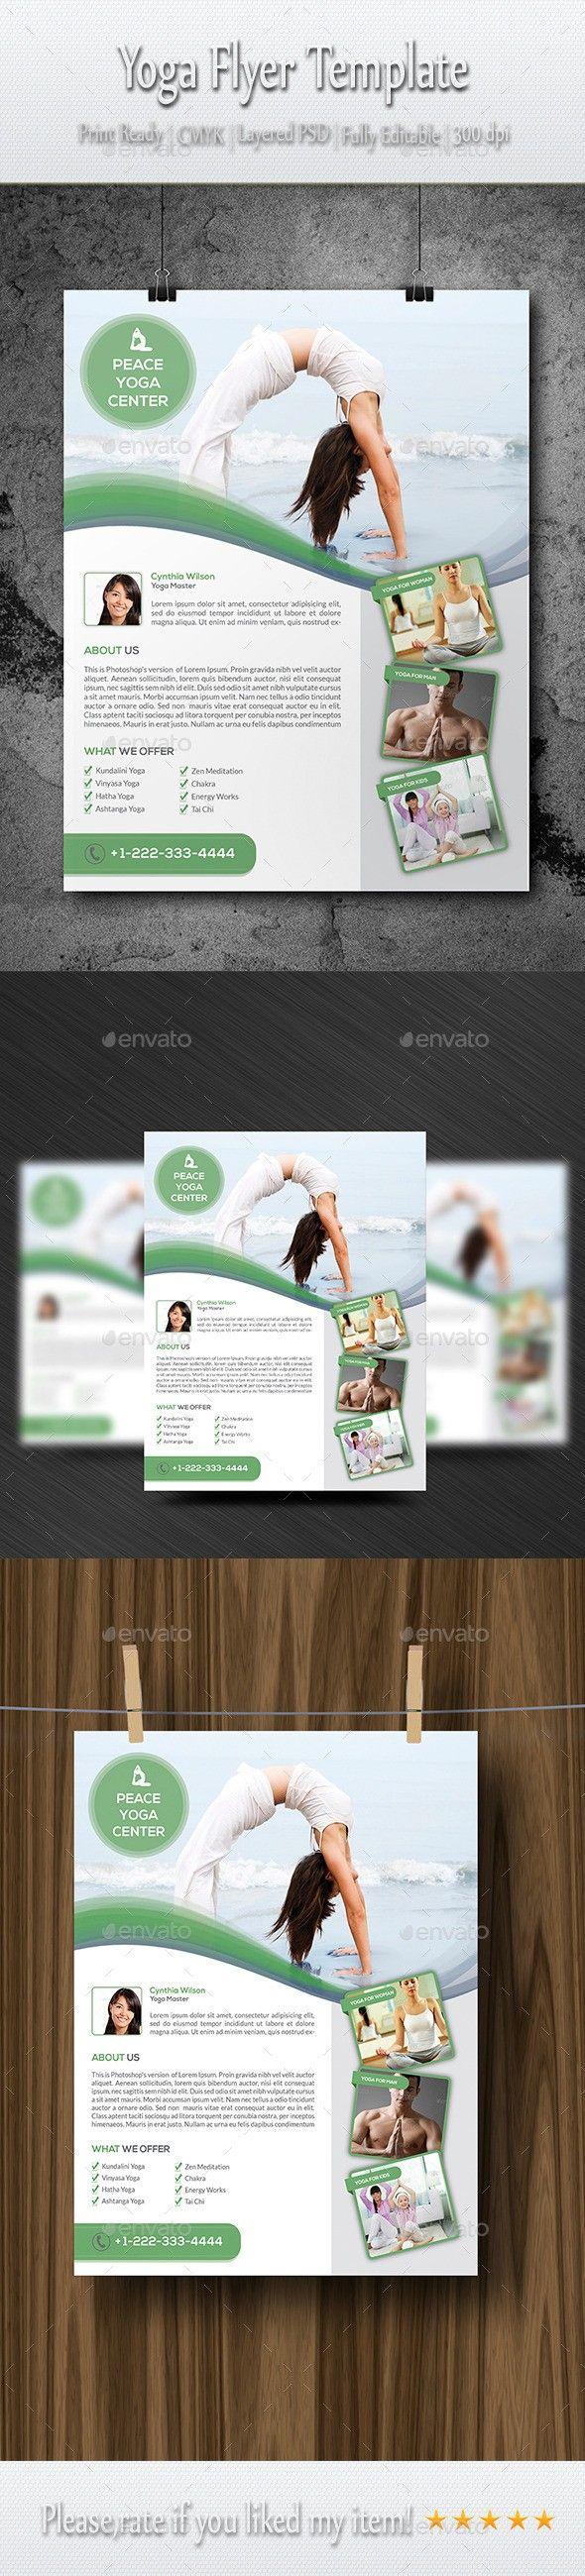 Yoga Flyer Template Pinterest Flyer Template Flyer Design